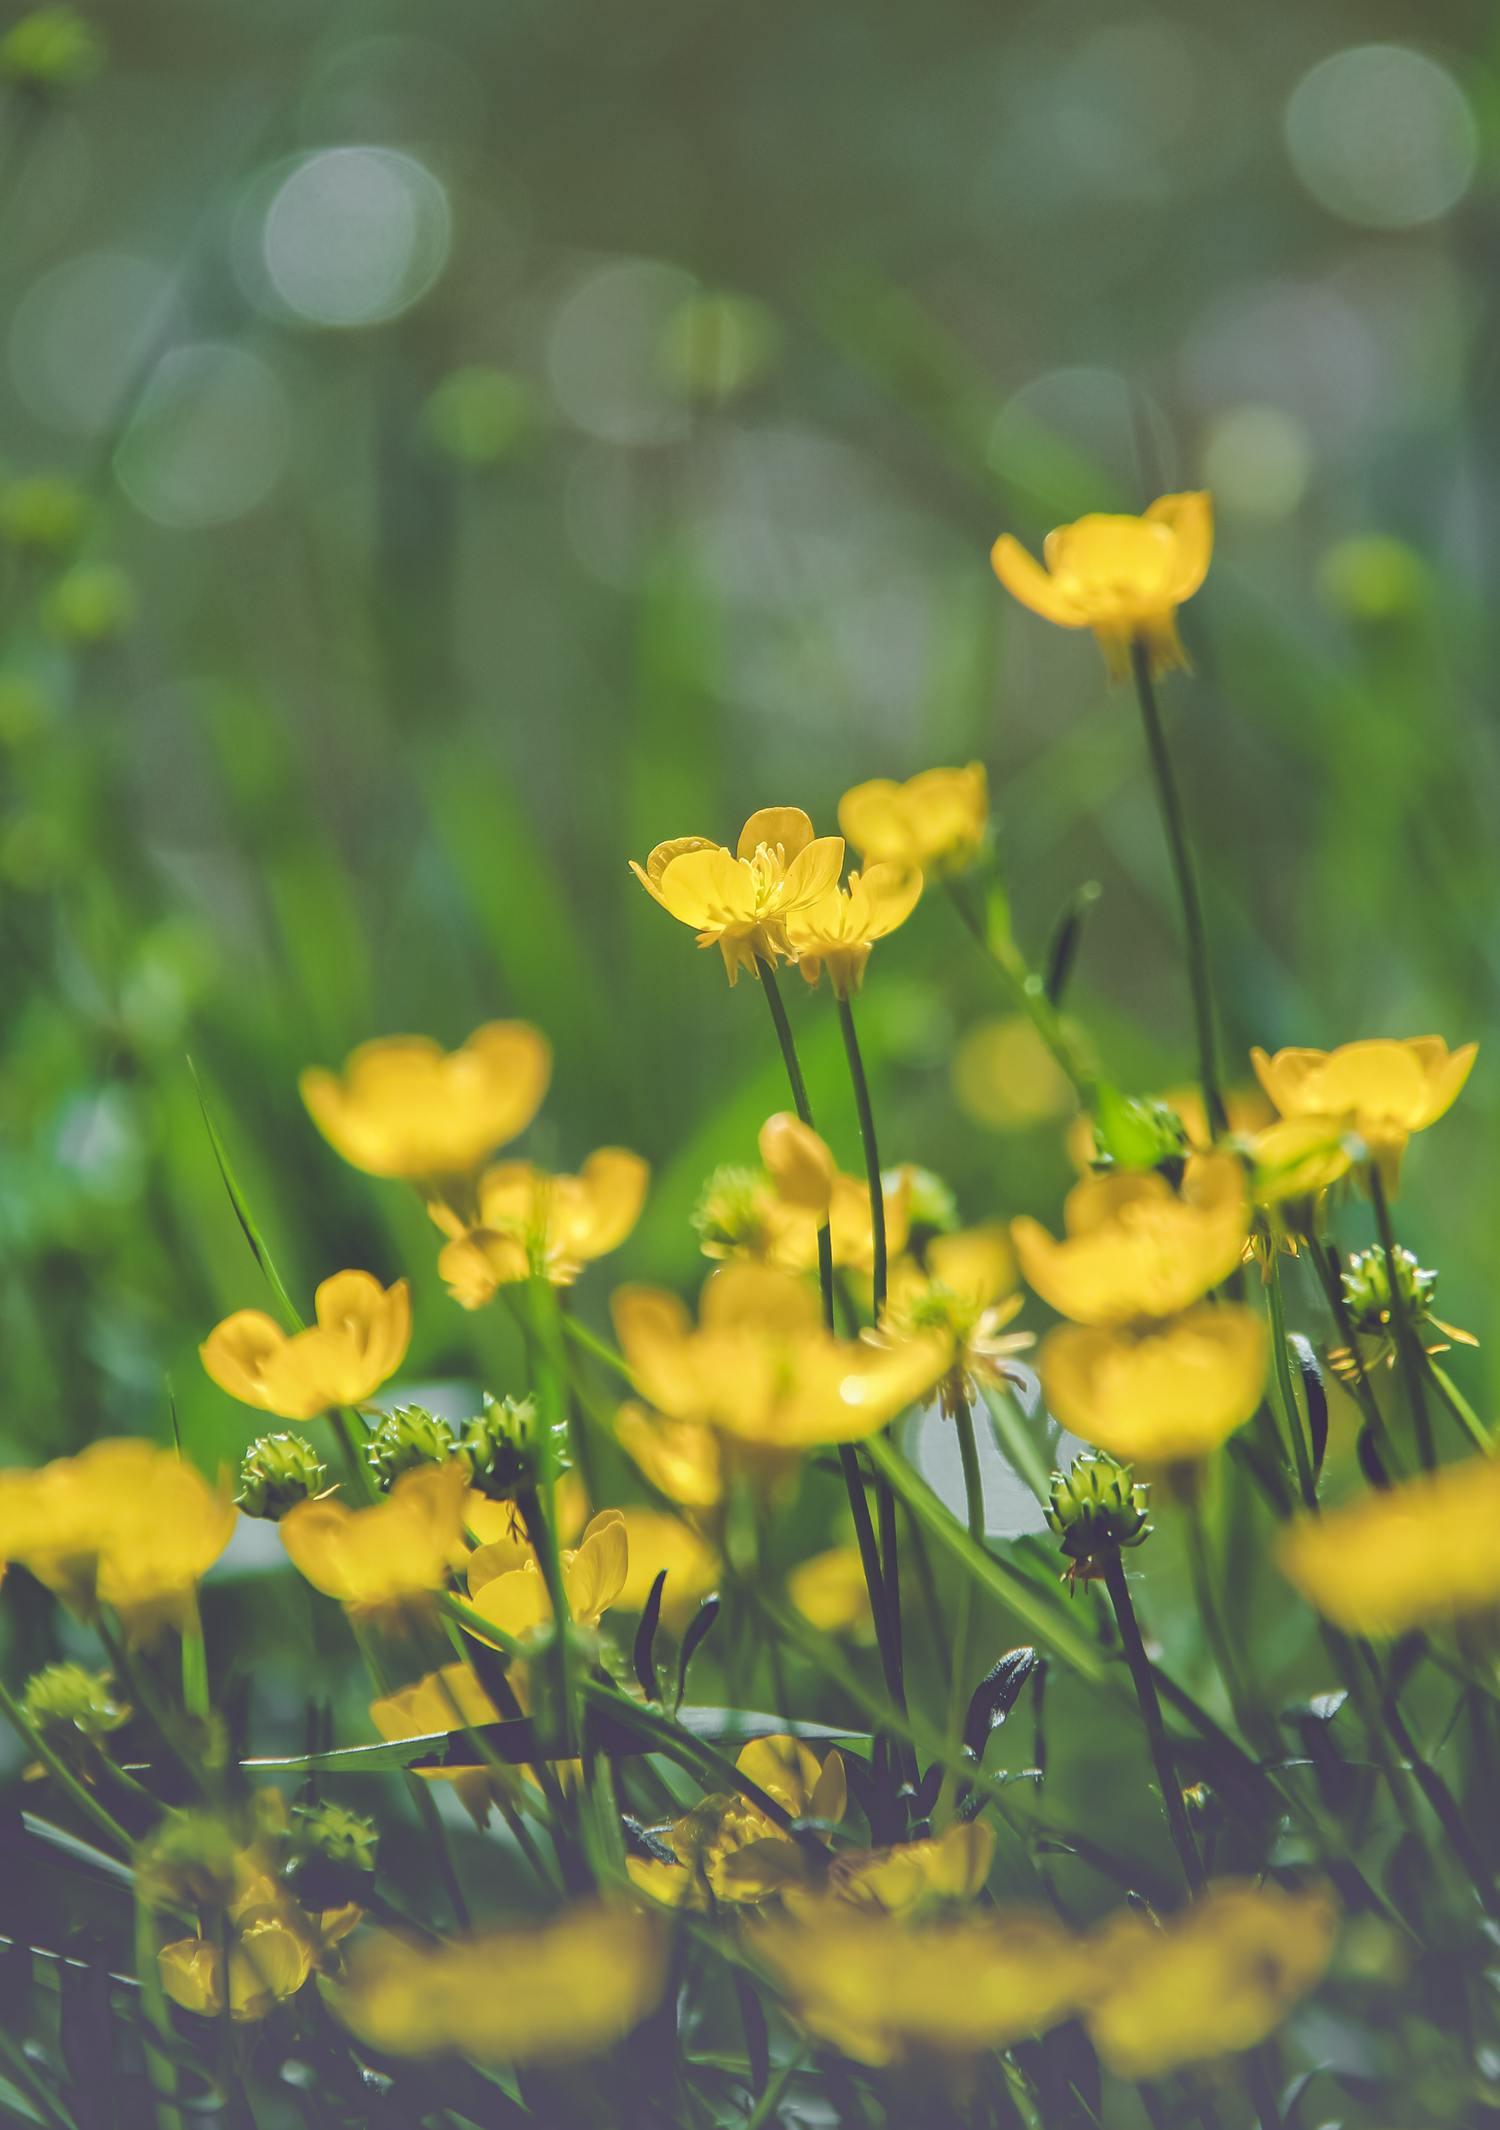 Flores amarillas con bokeh